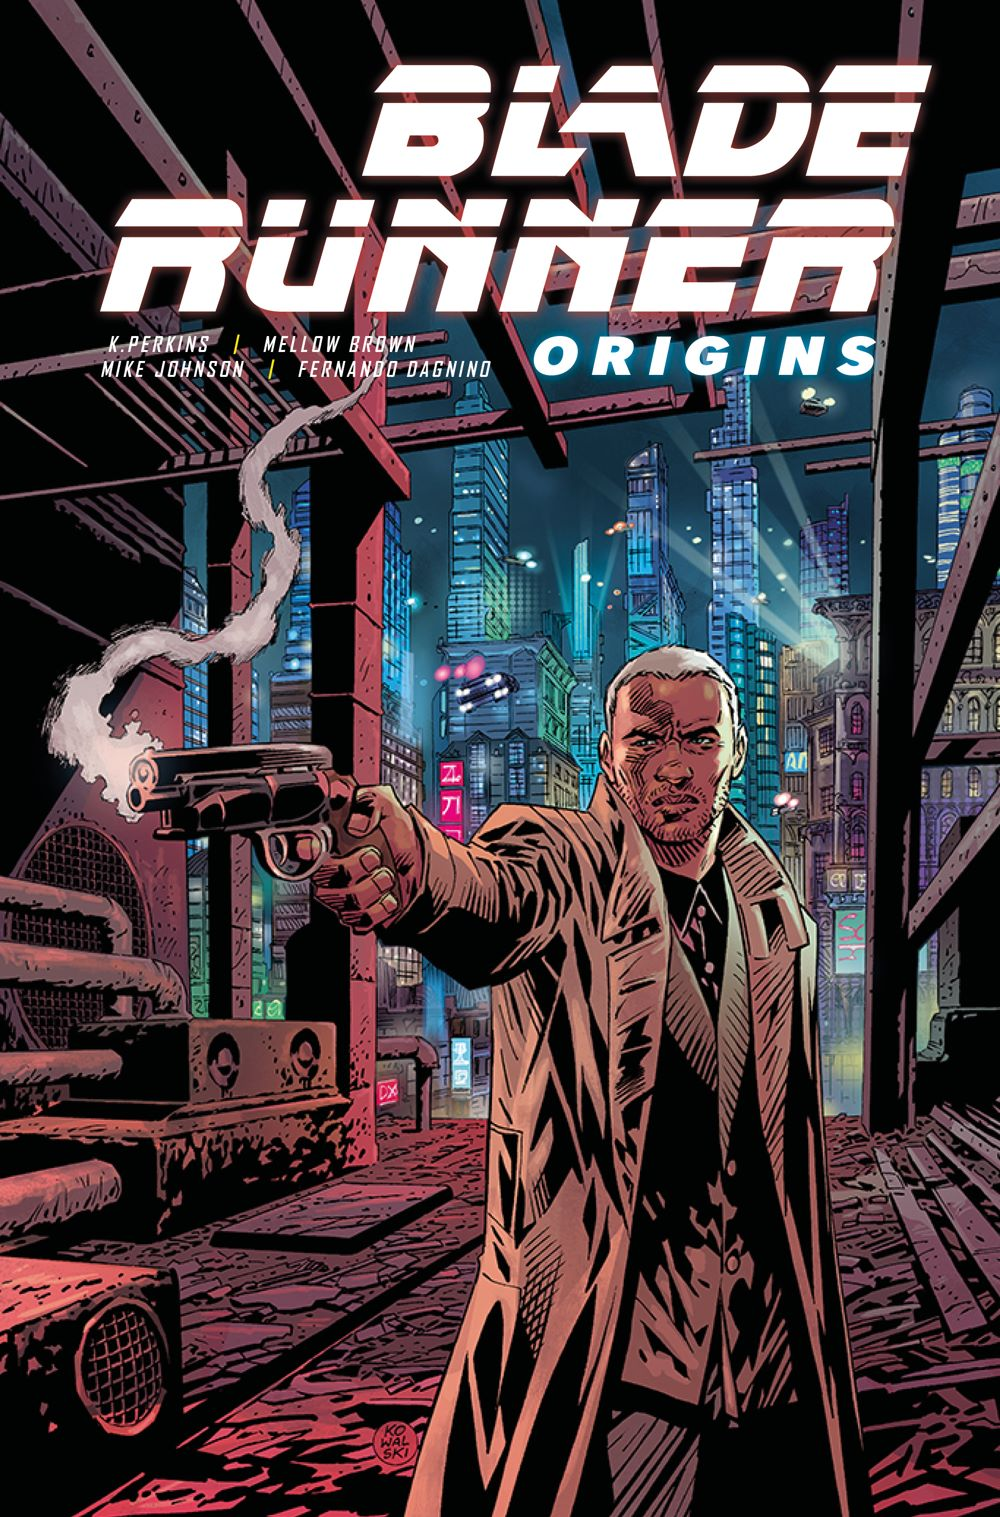 Blade-Runner-Origins_1_E_PIOTR-KOWALSKI ComicList Previews: BLADE RUNNER ORIGINS #1